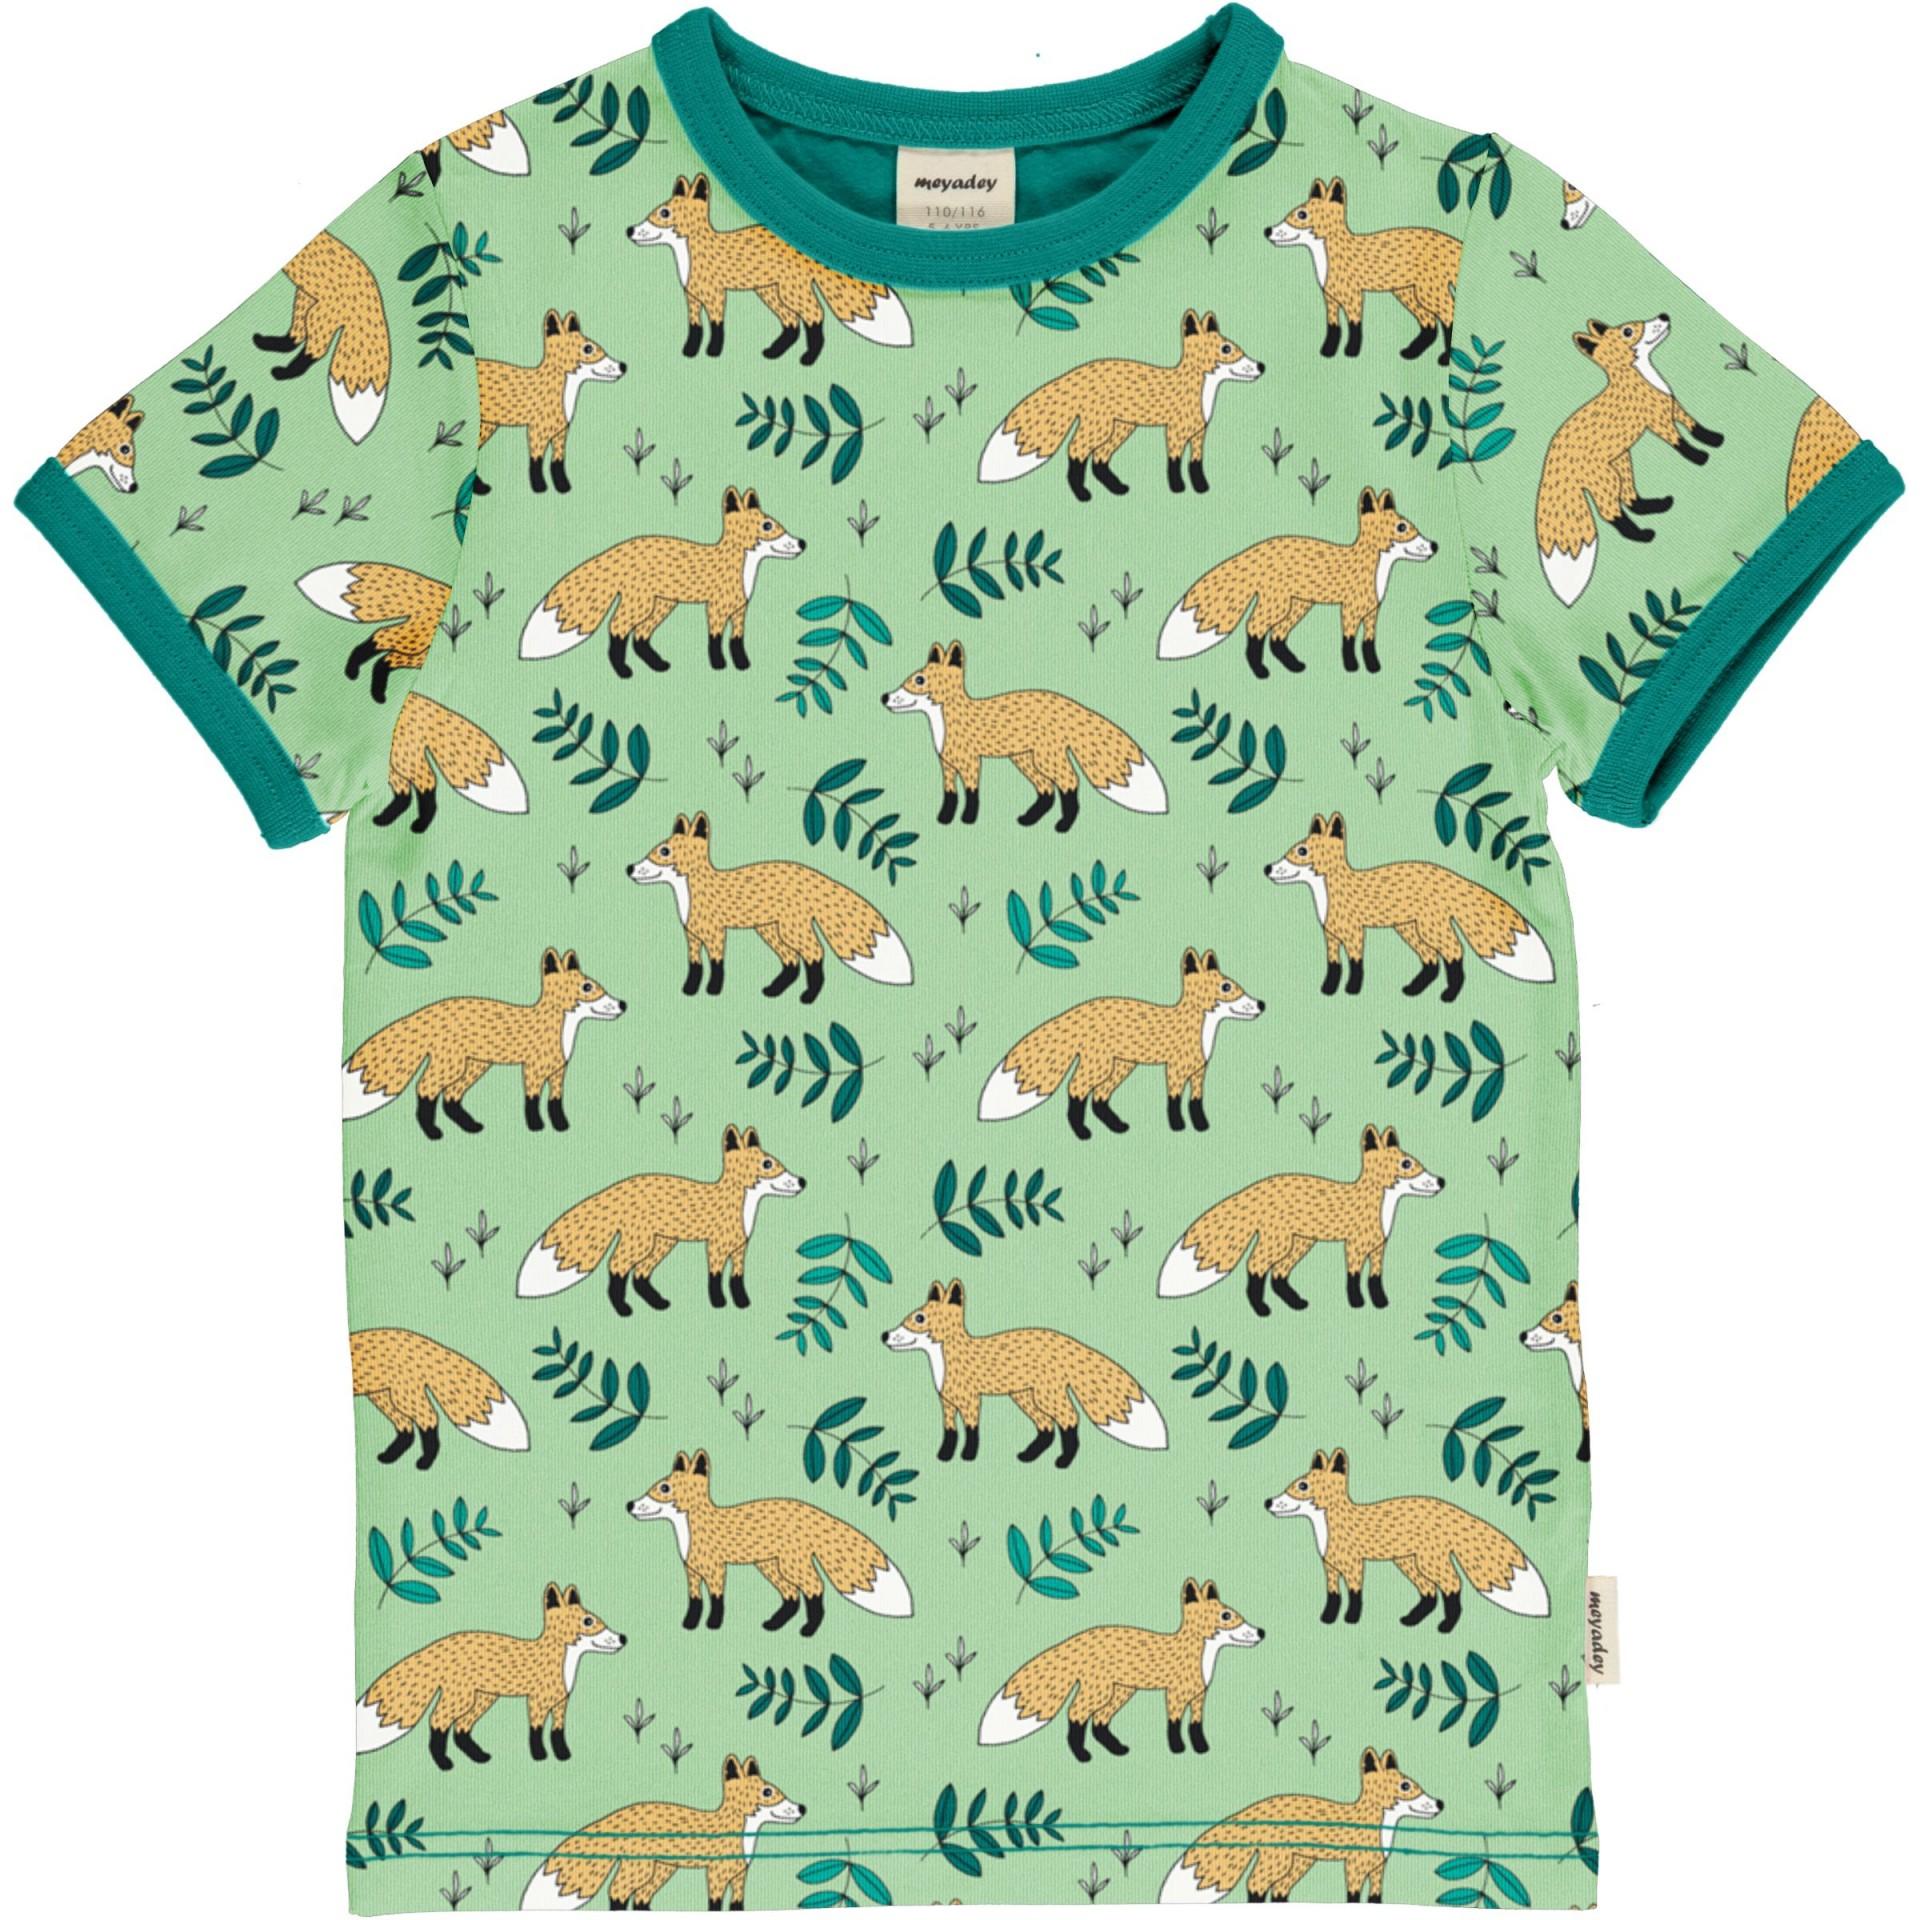 T-shirt WILD FOX Meyaday (Tamanhos disponíveis 9-12m, 18-24m)